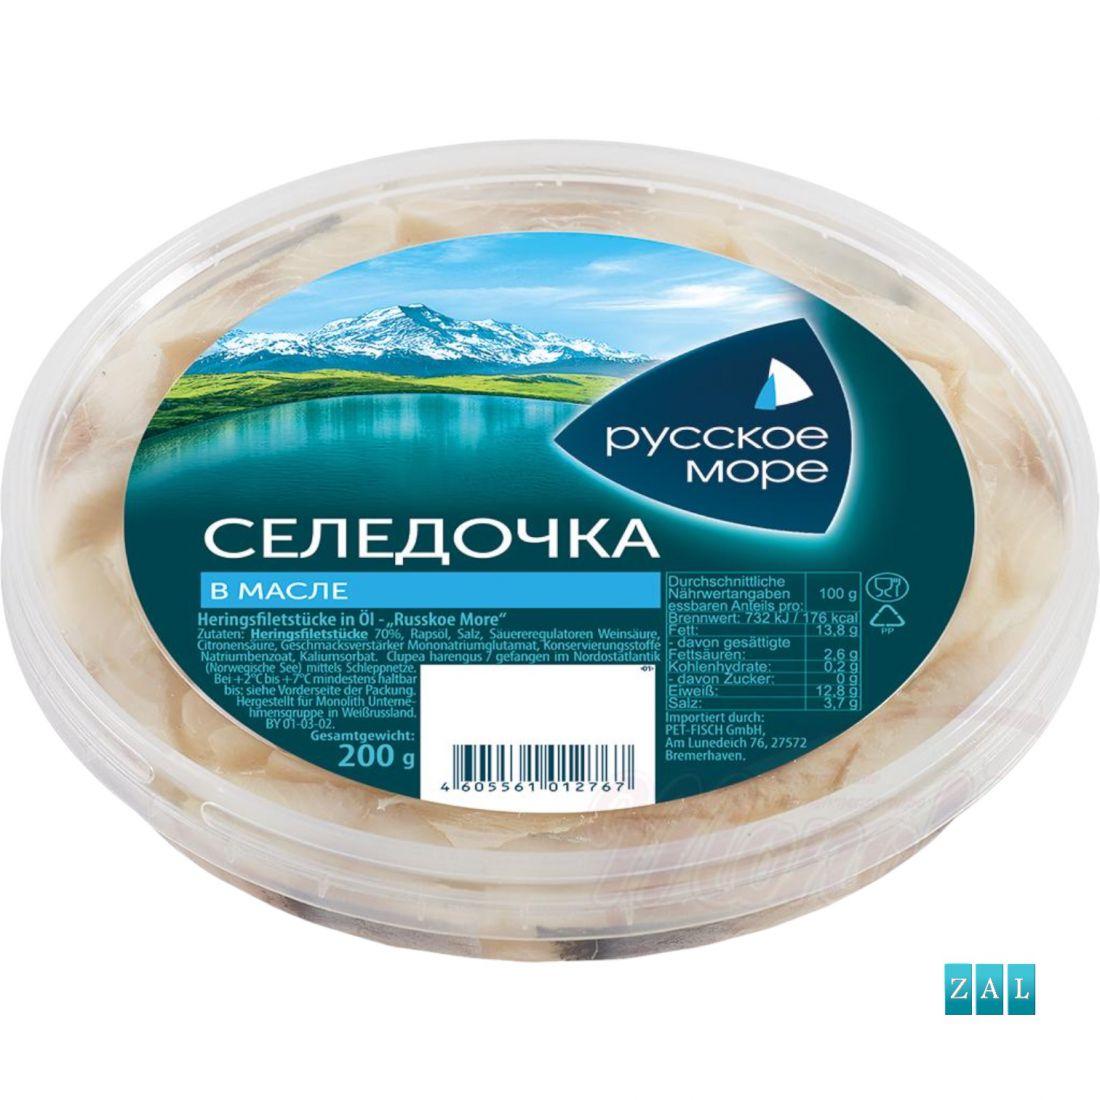 """Russzkoje More"" darabos heringfilé olajban 200g"